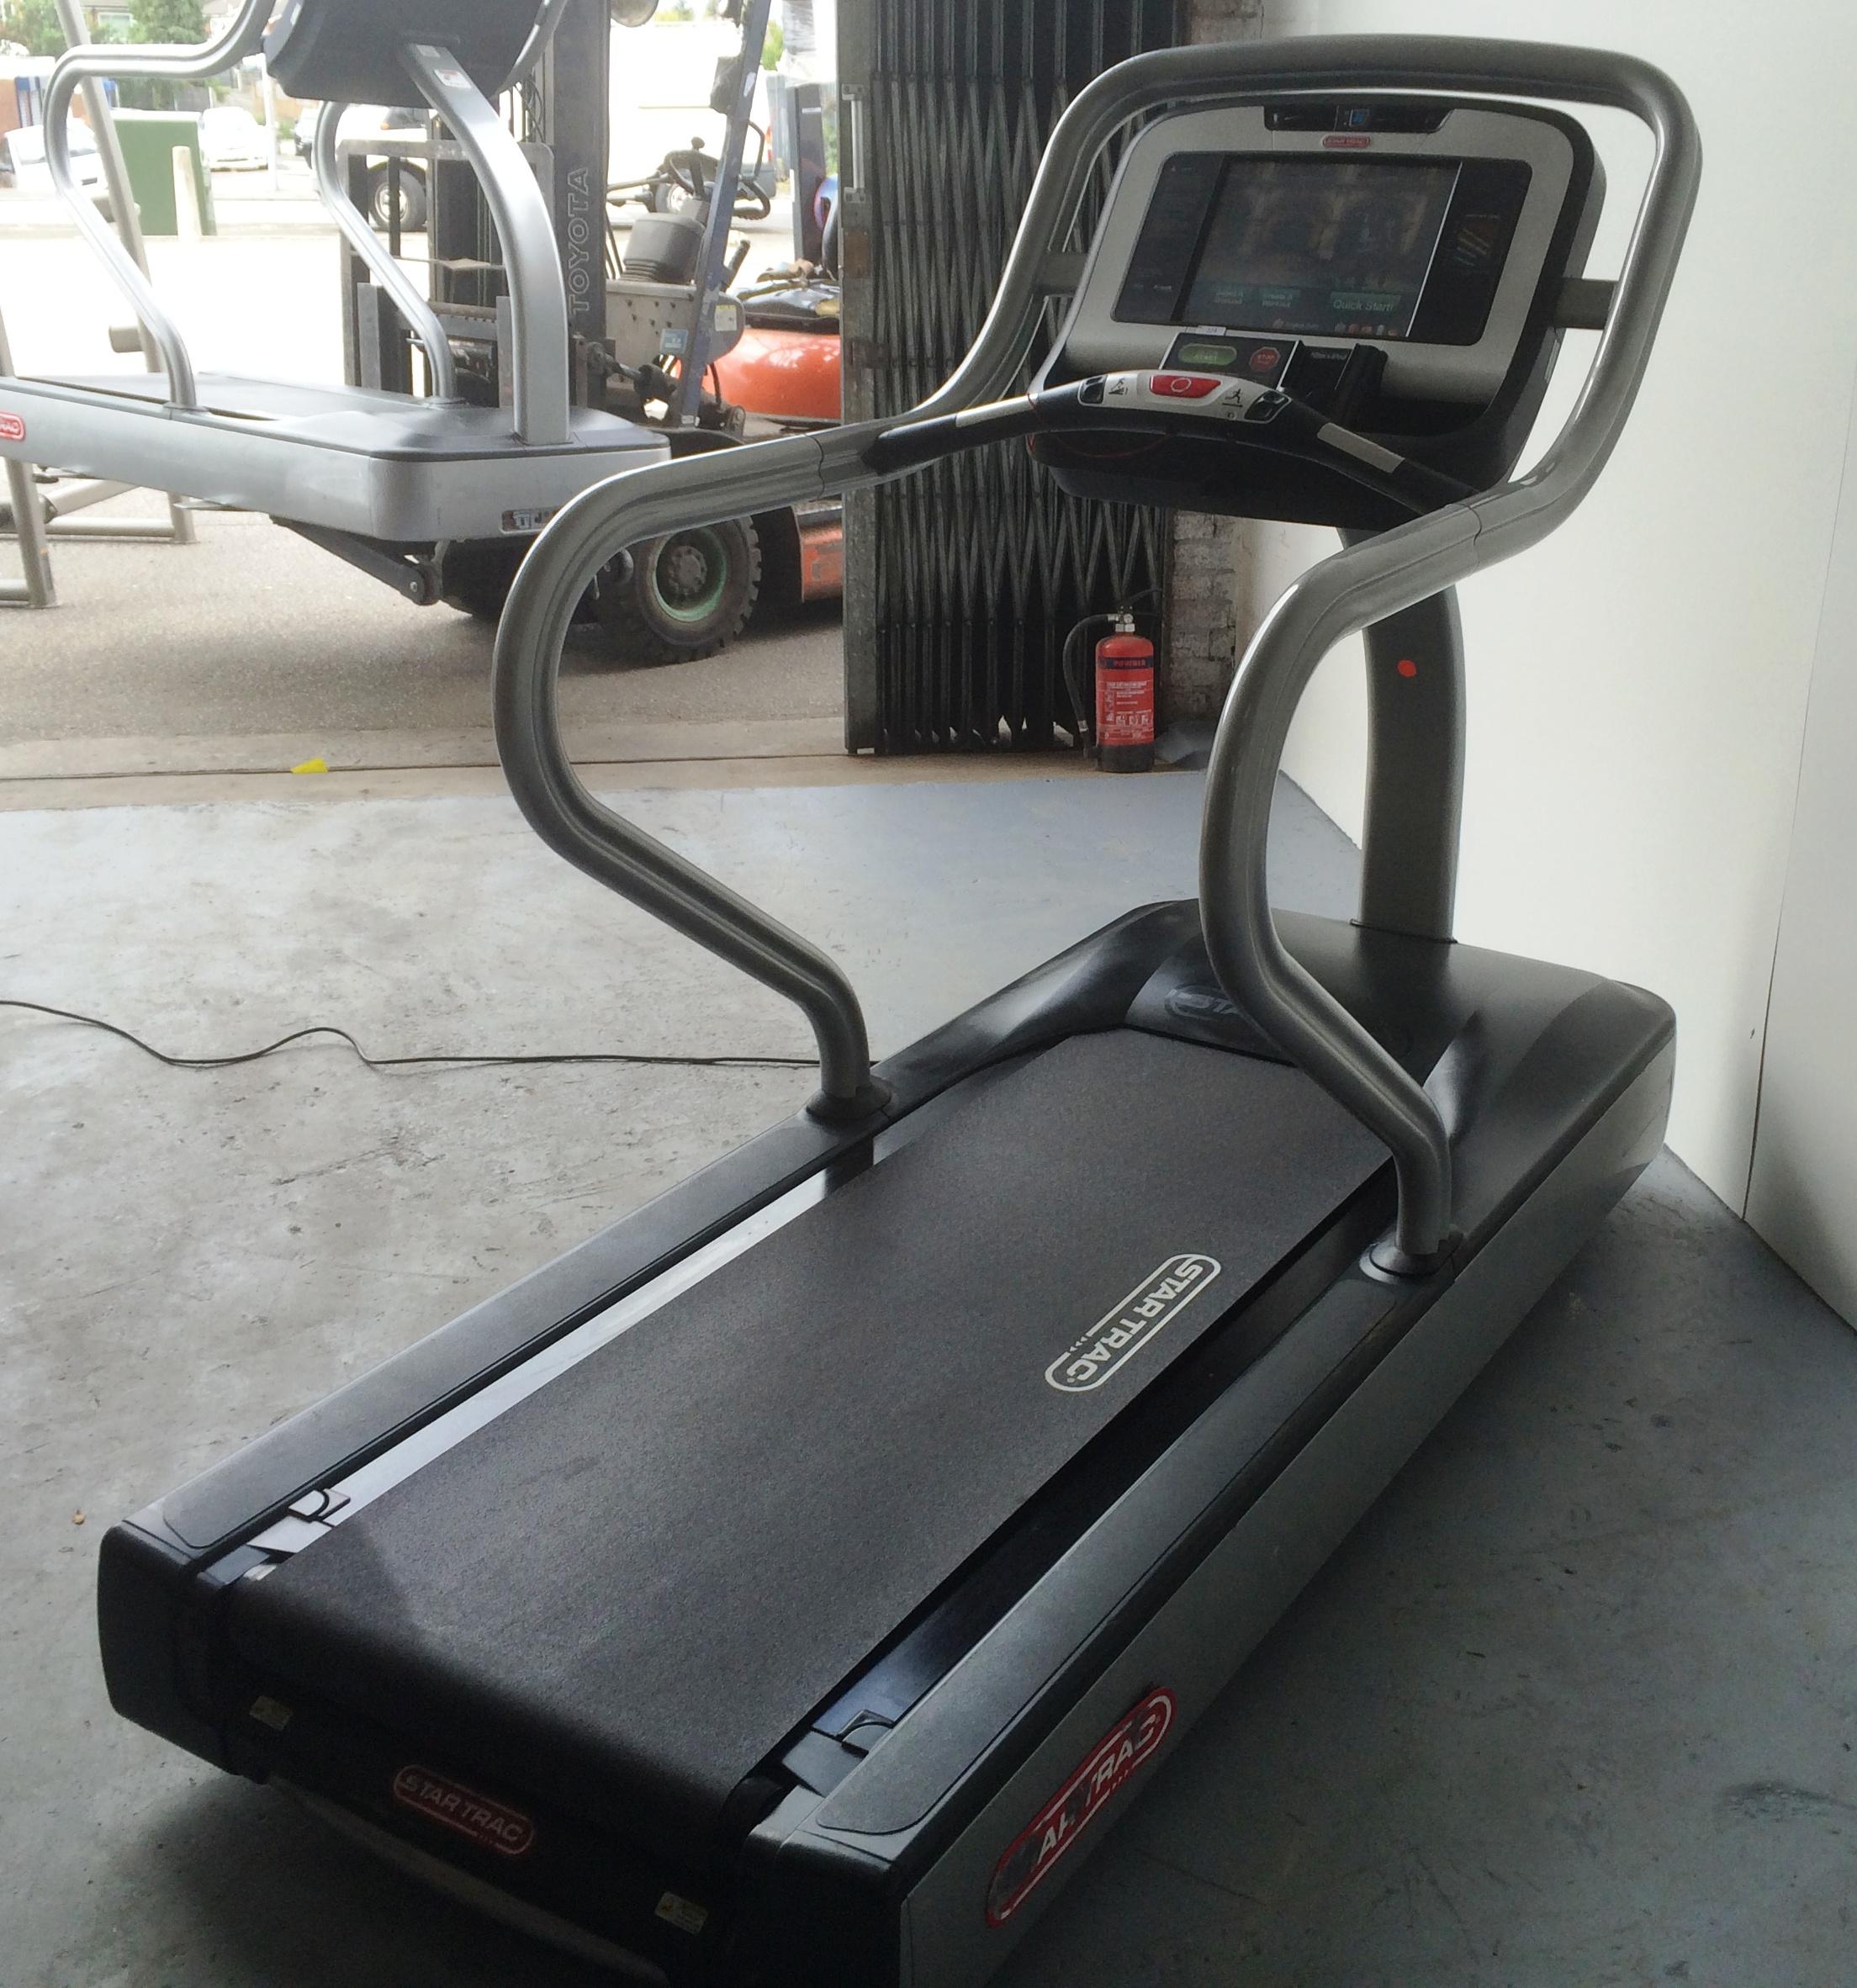 Star Trac Tr901 Treadmill Cost: Make: Star Trac Model: E TRX Series Serial No: TREX0907